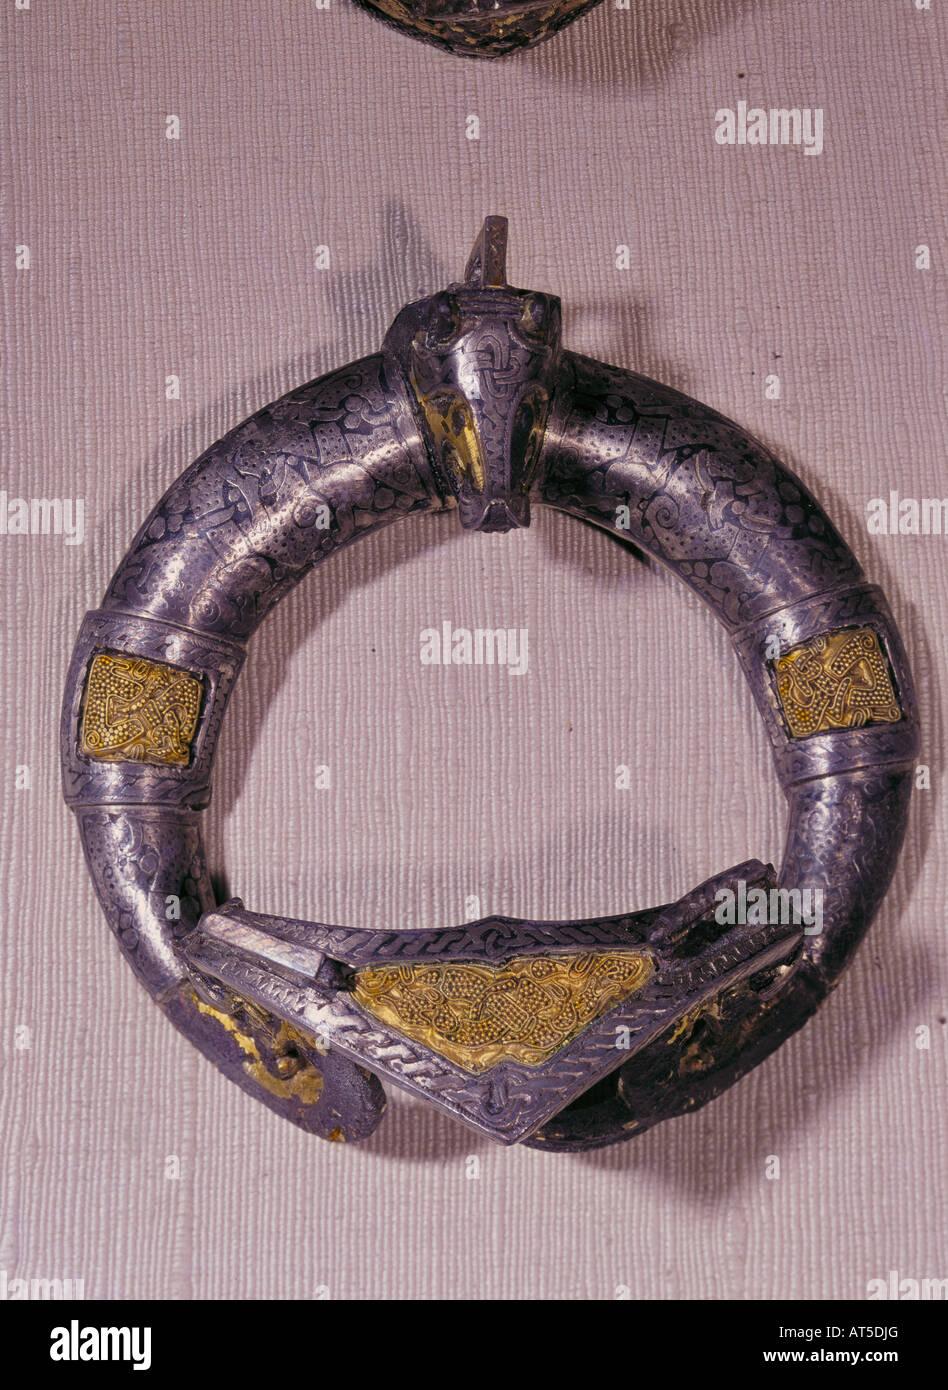 fine arts, Middle Ages, Vikings, fibula, cast bronze, silvered, partly gilded, diameter 9.8 cm, Gotland, Sweden, - Stock Image